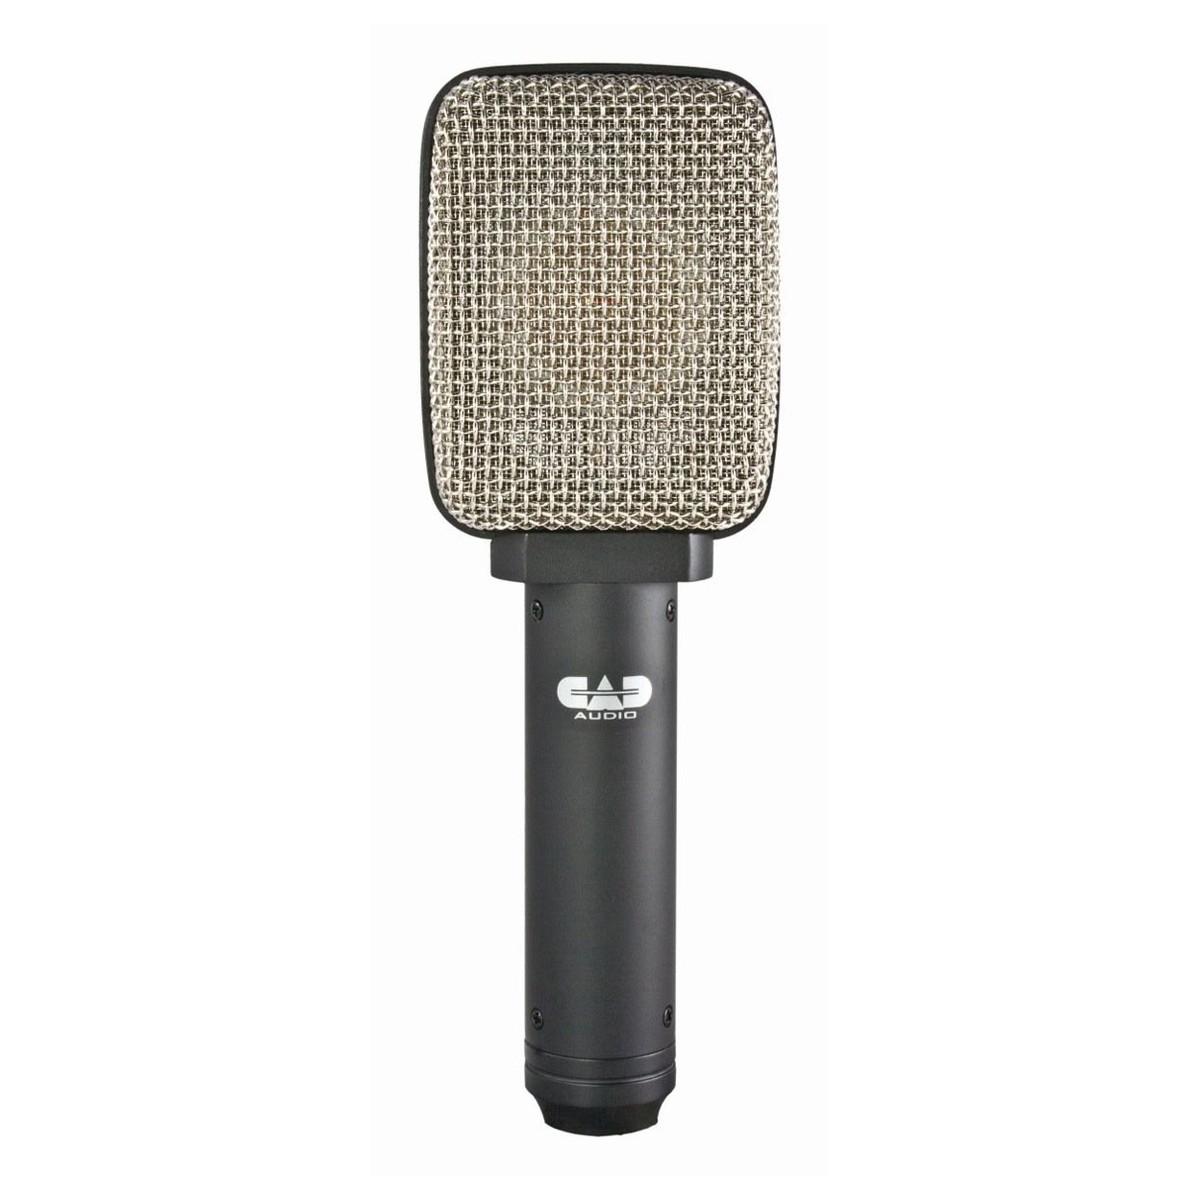 cad d80 large diaphragm dynamic microphone at gear4music. Black Bedroom Furniture Sets. Home Design Ideas